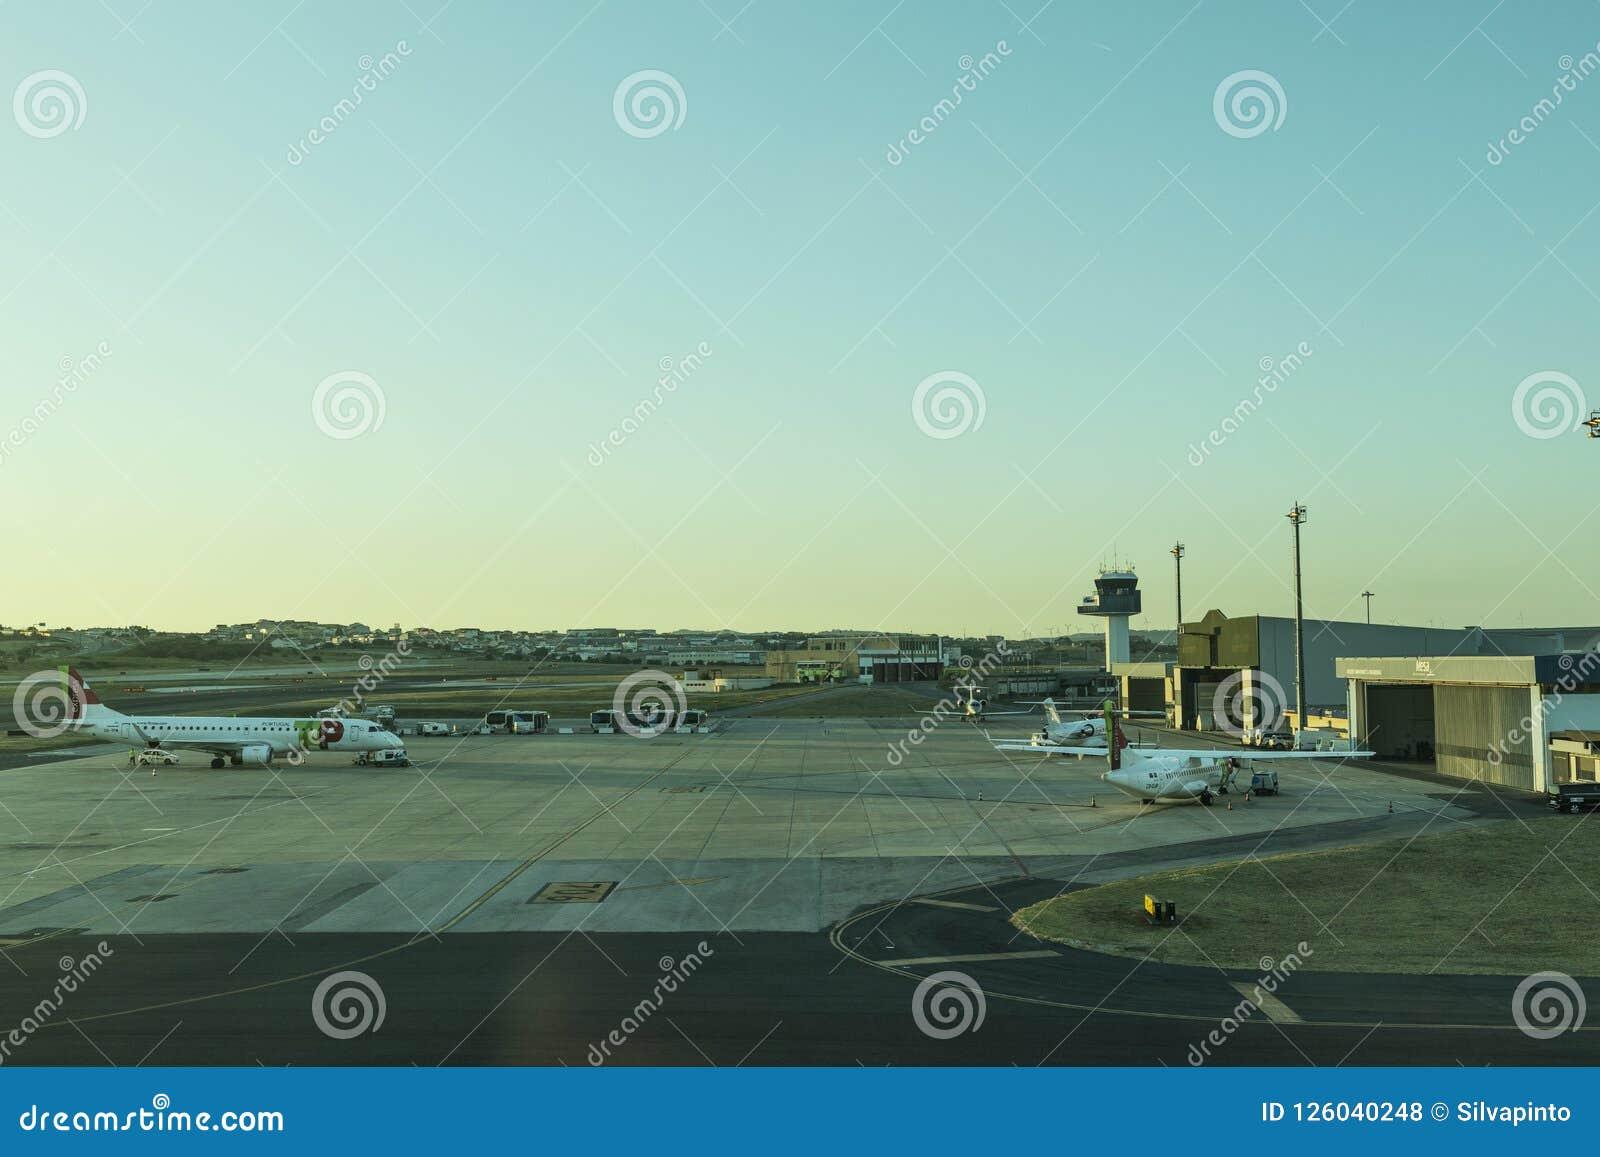 Flughafenschutzblech LISBON/PORTUGAL AM 11. AUGUST 2018 - Lissabon mit Sonnenunterganglicht